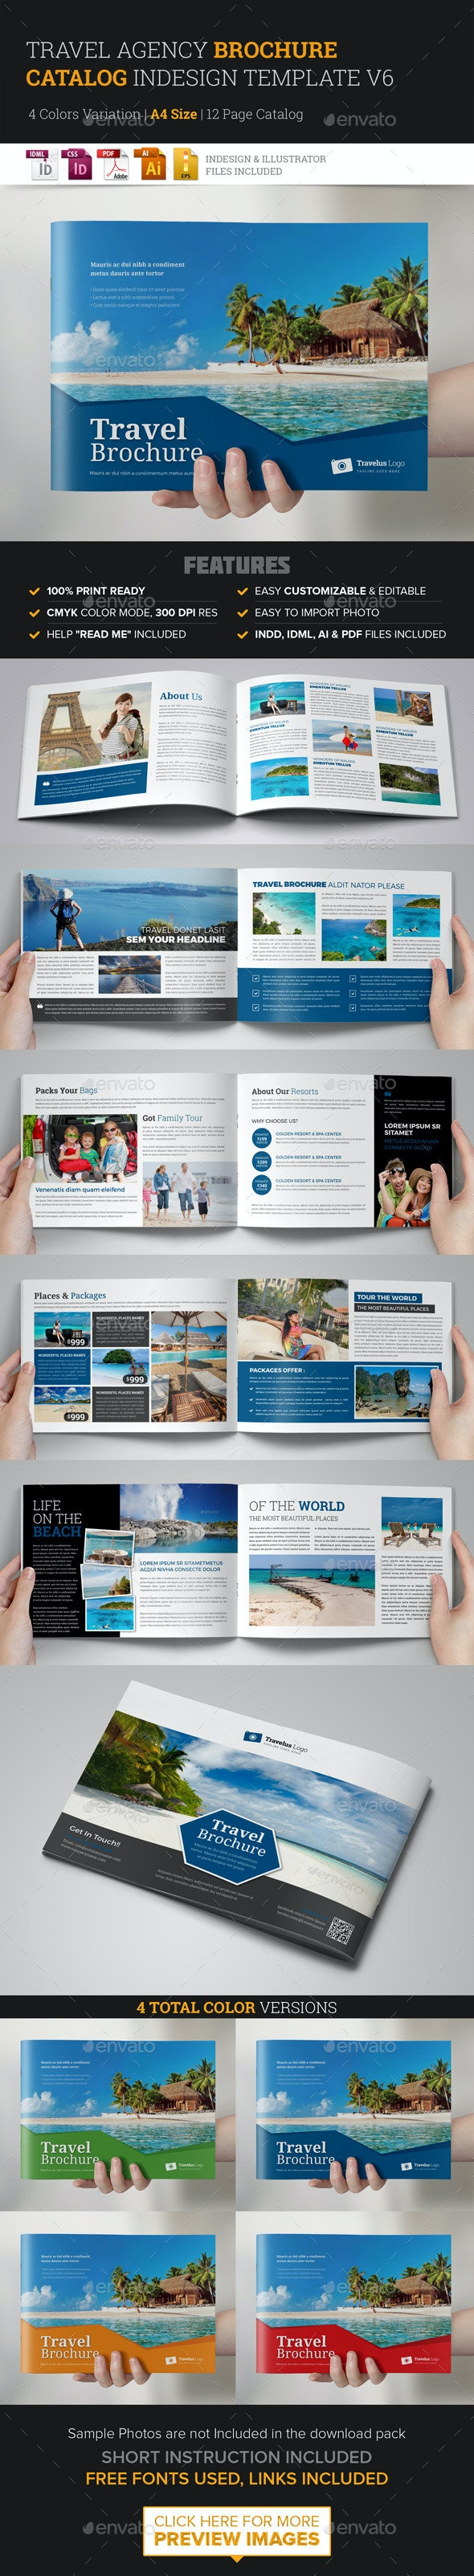 Travel Brochure Catalog InDesign Template v6 - Corporate Brochures